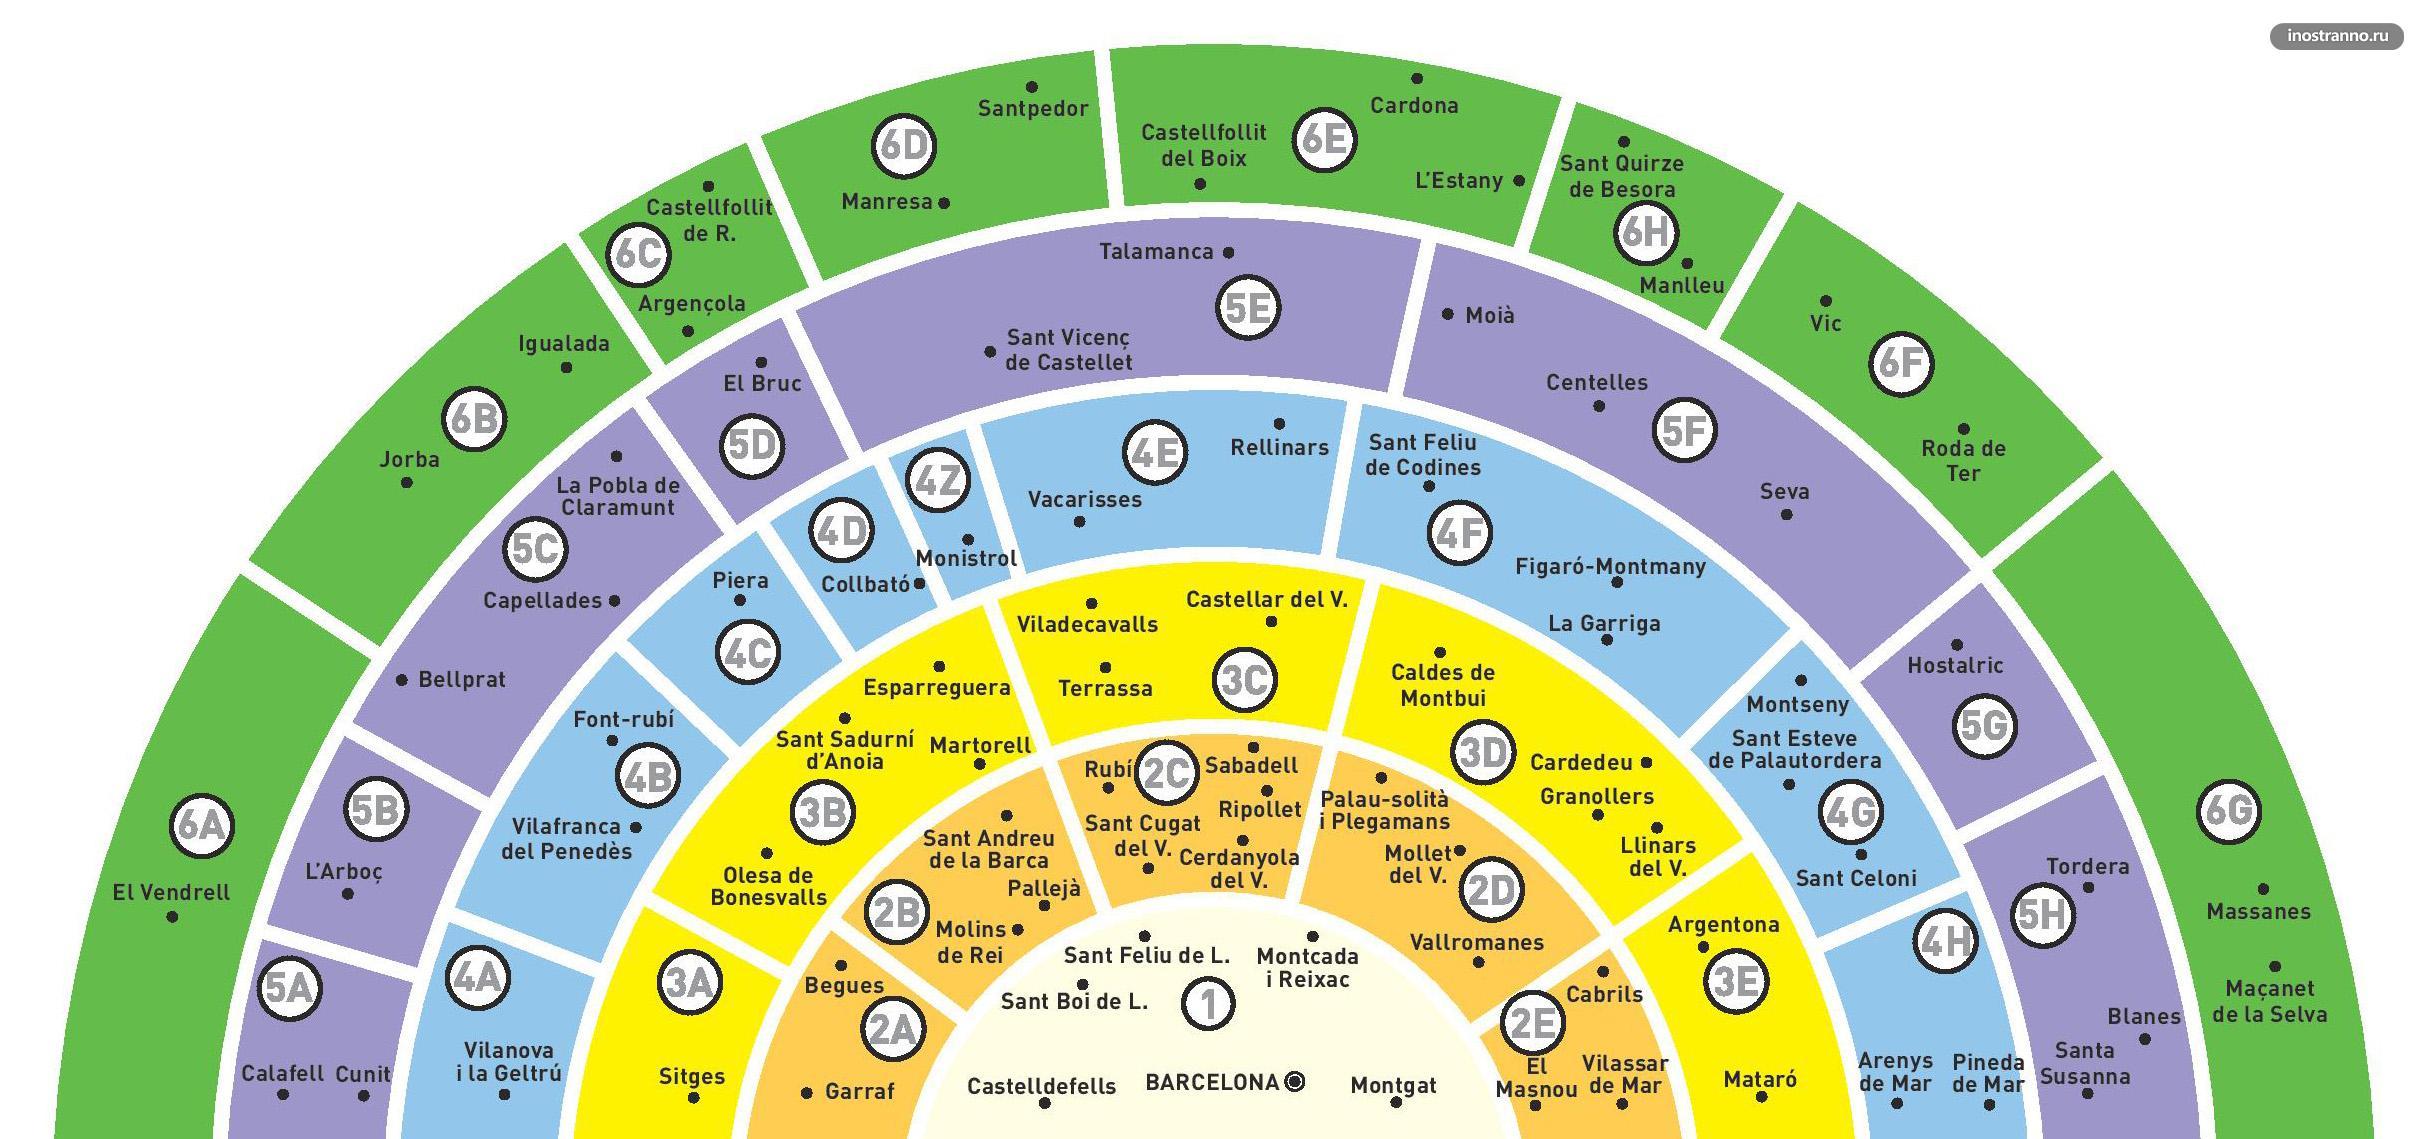 Барселона карта тарифных зон